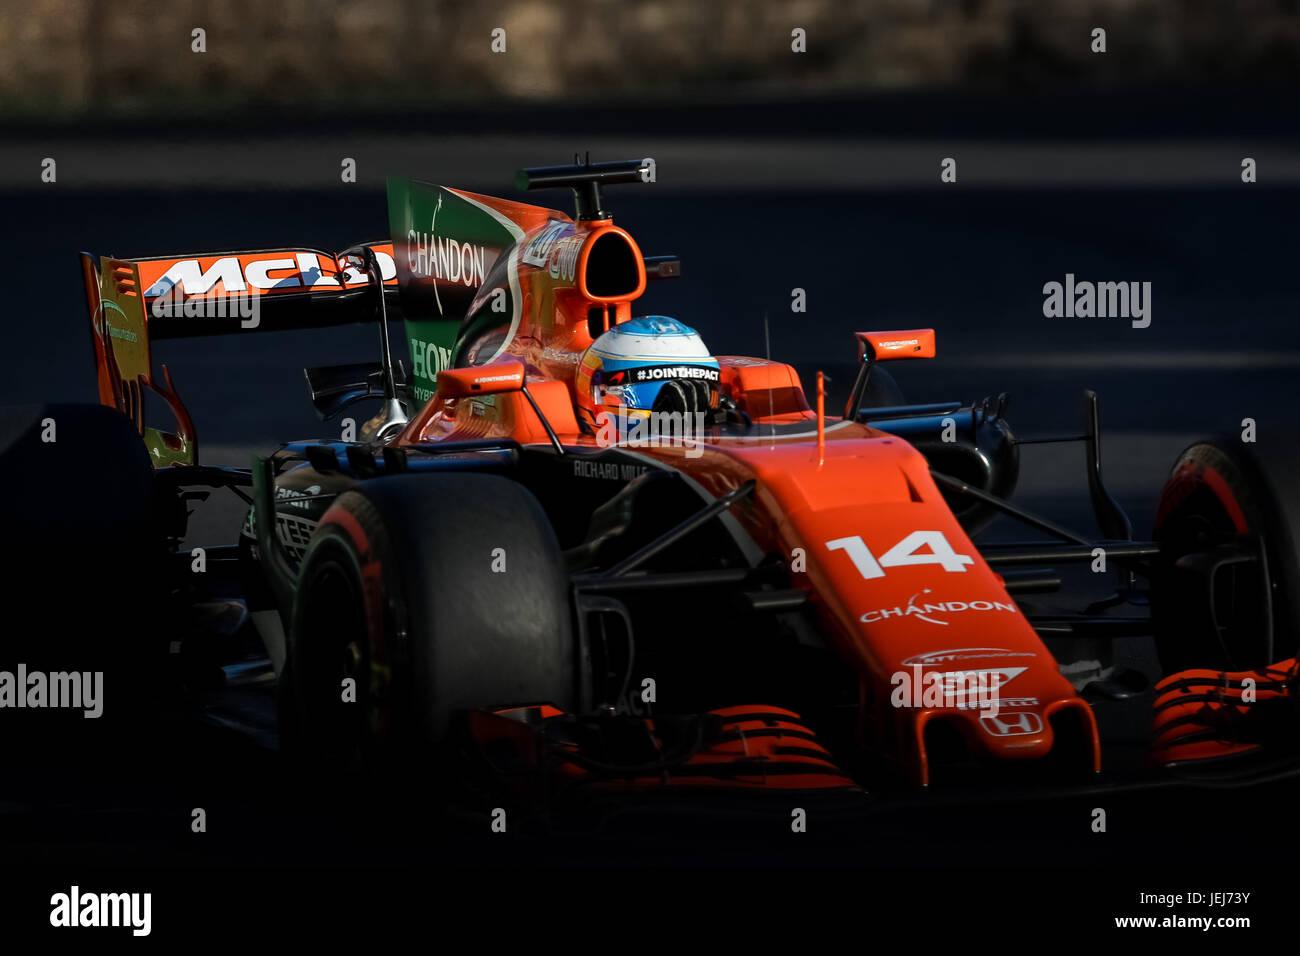 spanish formula one driver fernando alonso of mclaren honda f1 team